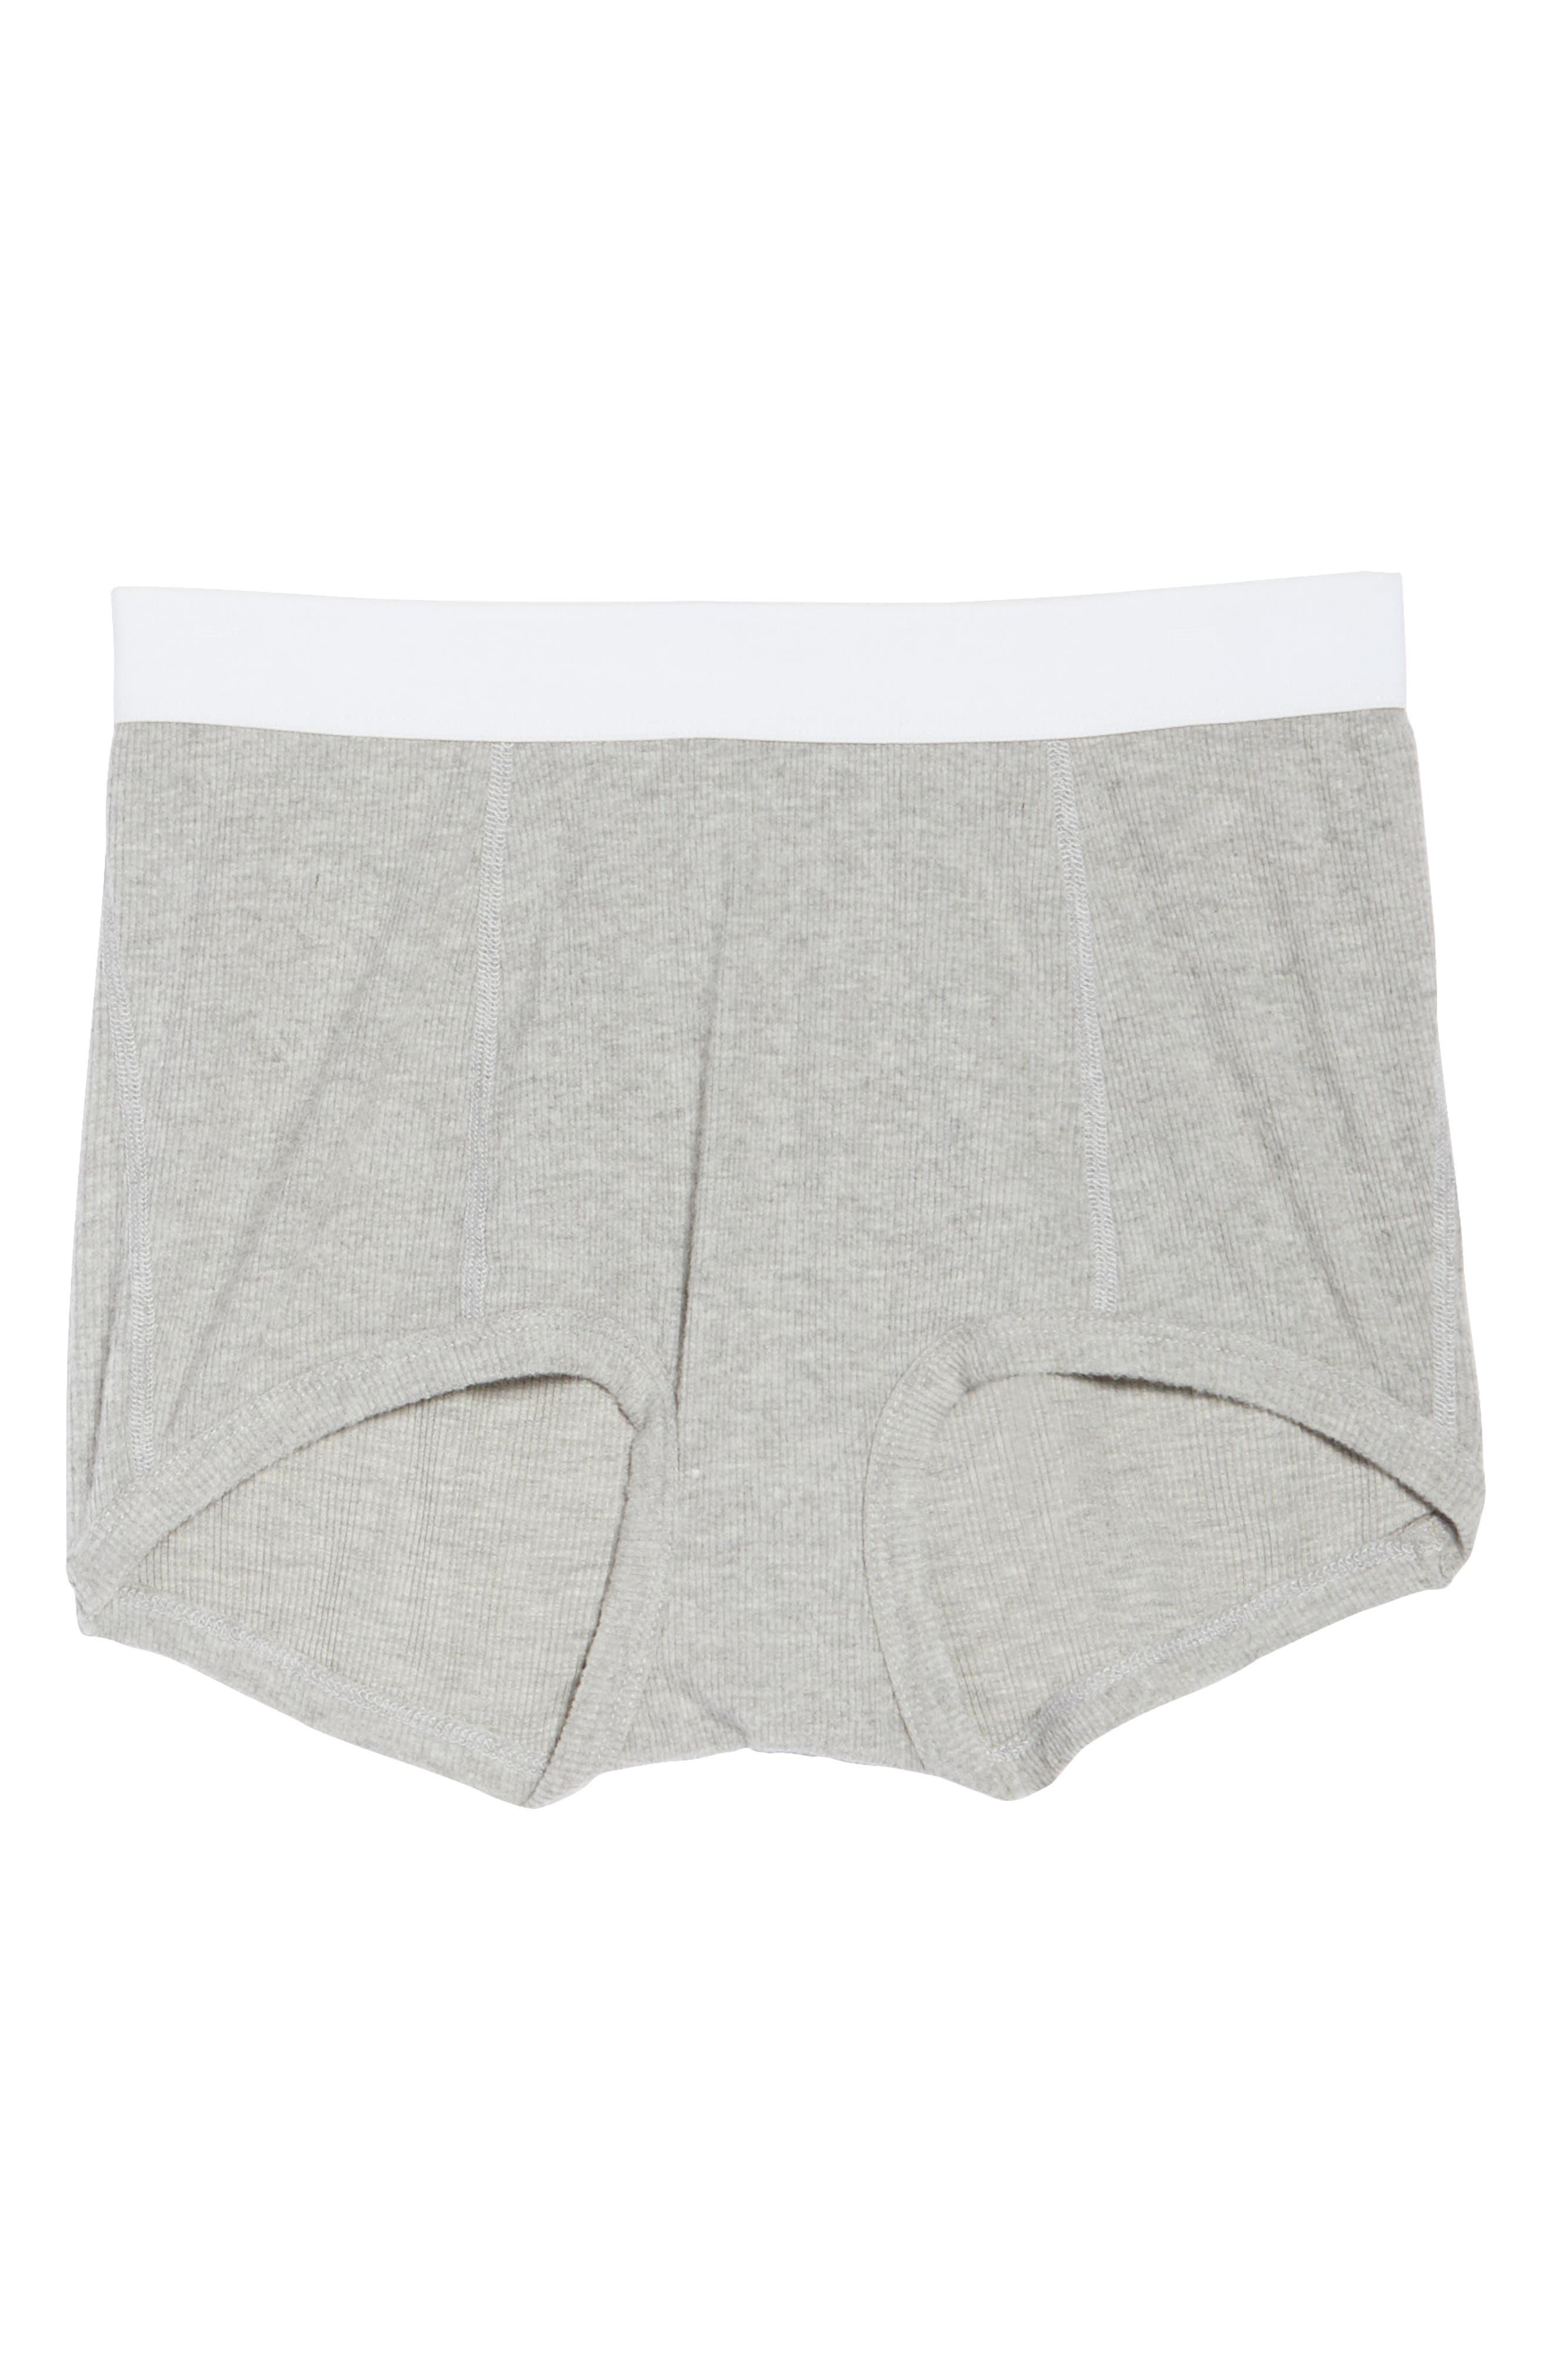 Peony Shorts,                             Alternate thumbnail 6, color,                             021